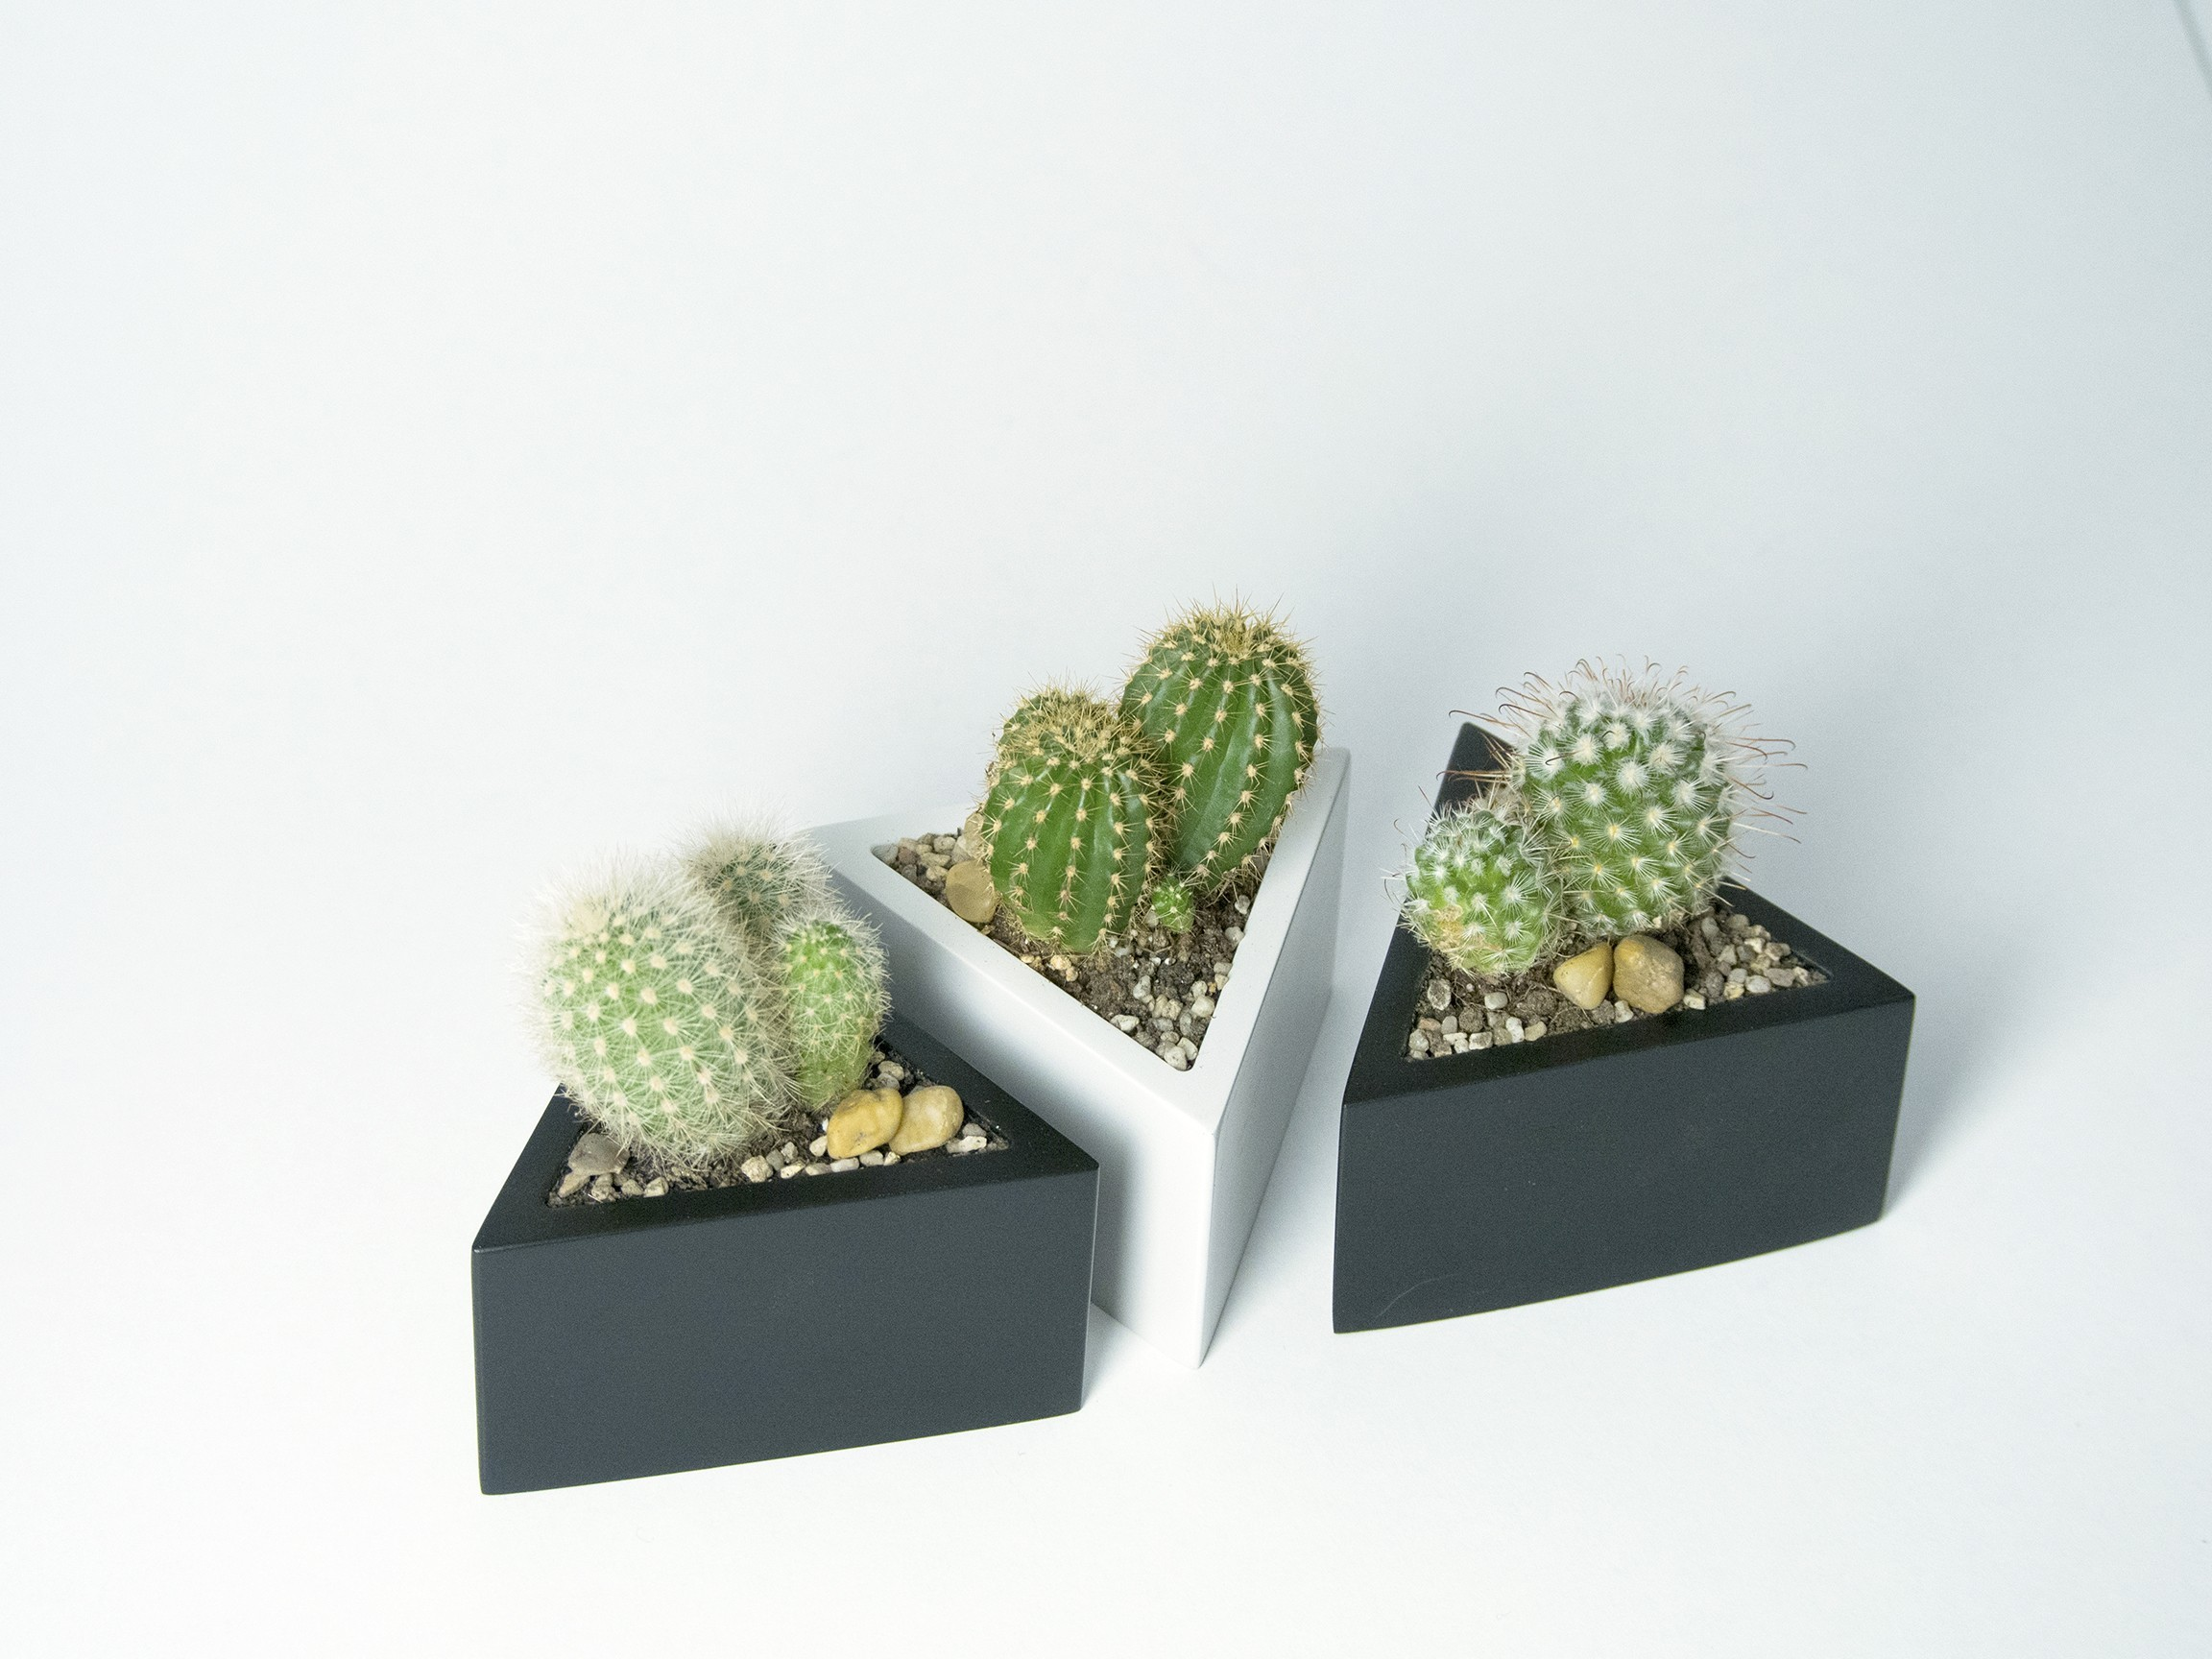 P2090296.jpg Download STL file Prisma planter • 3D print template, atelierro